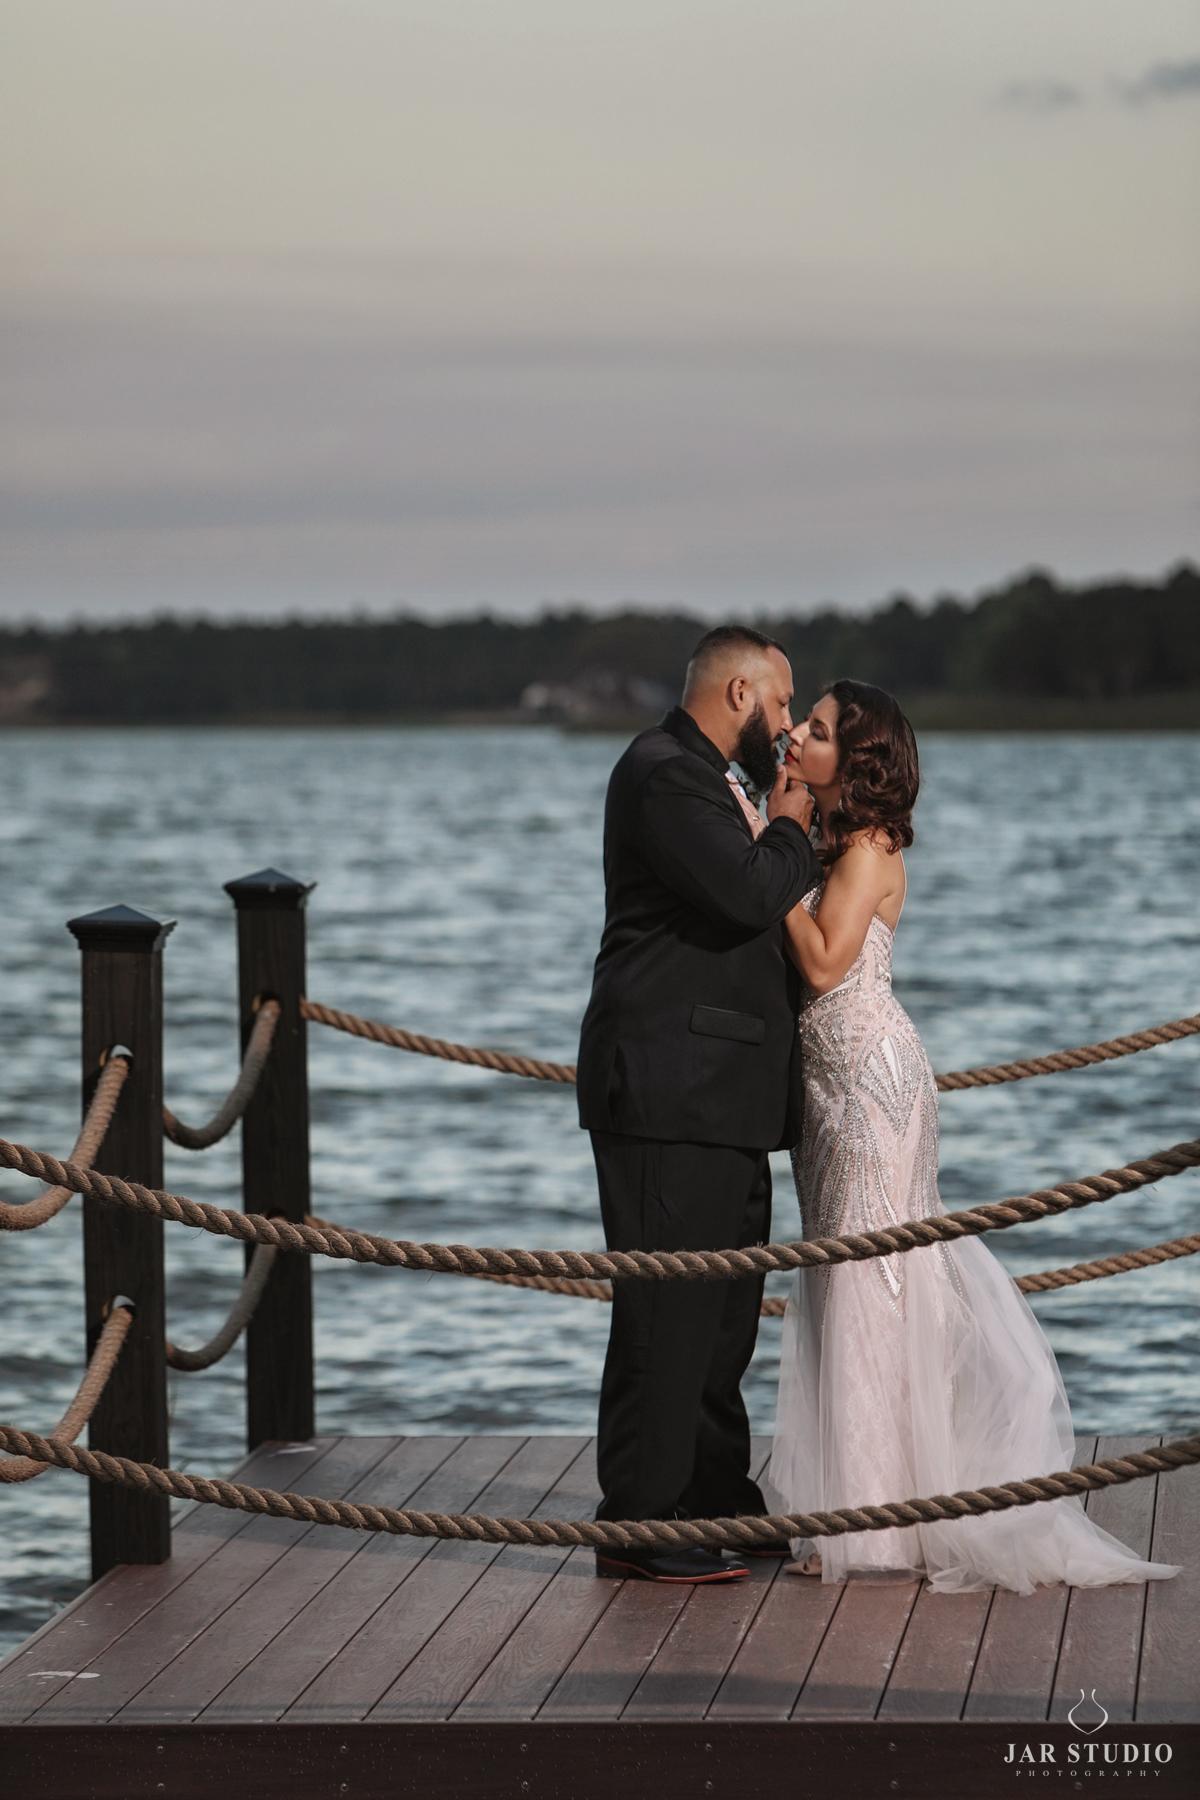 27-BH-amazing-bride-groom-photography-jarstudio.jpg